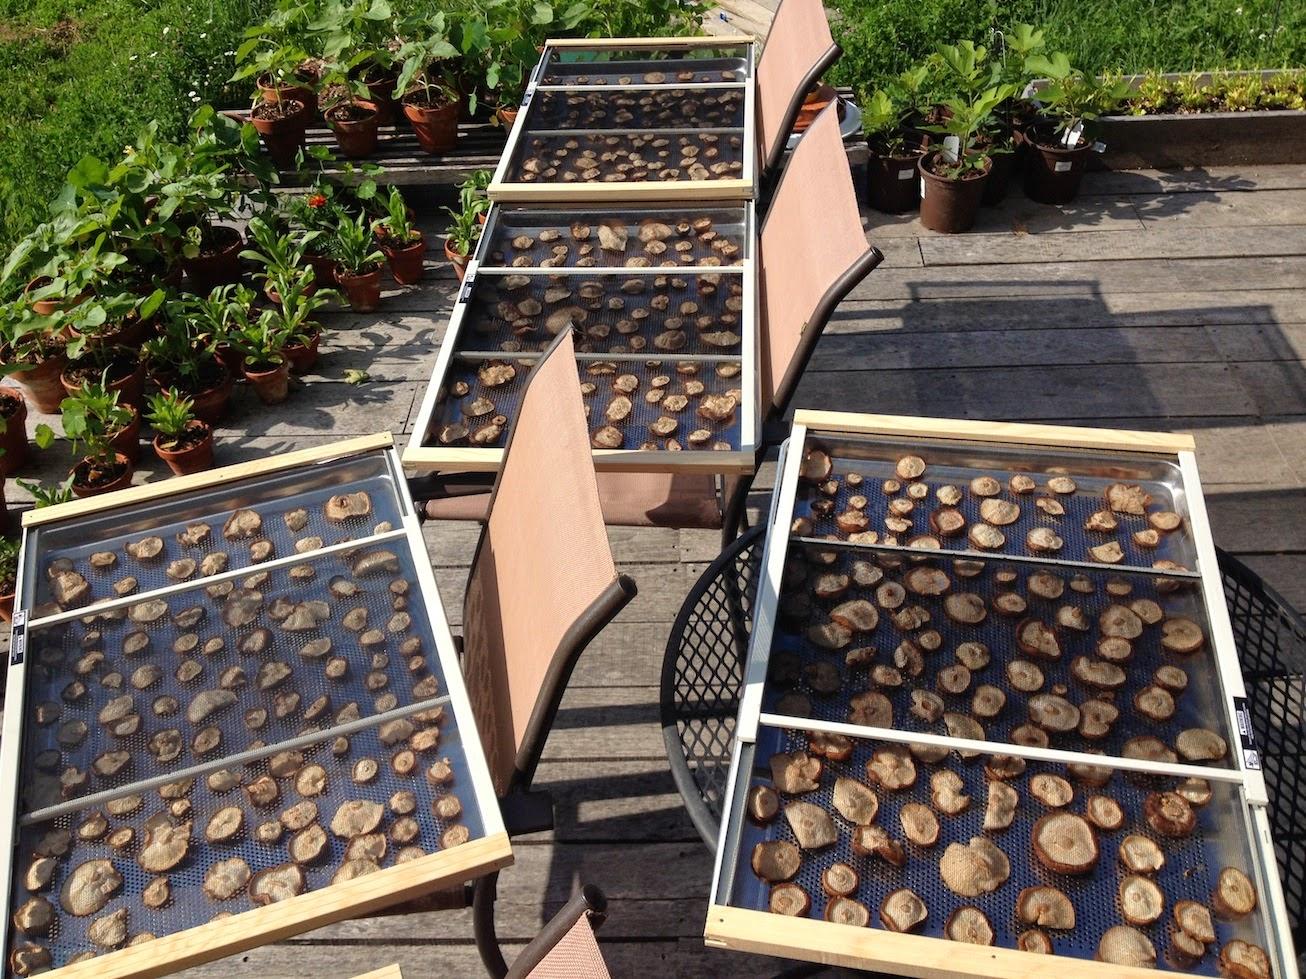 Wellspring forest farm - Wild mushrooms business ideas ...